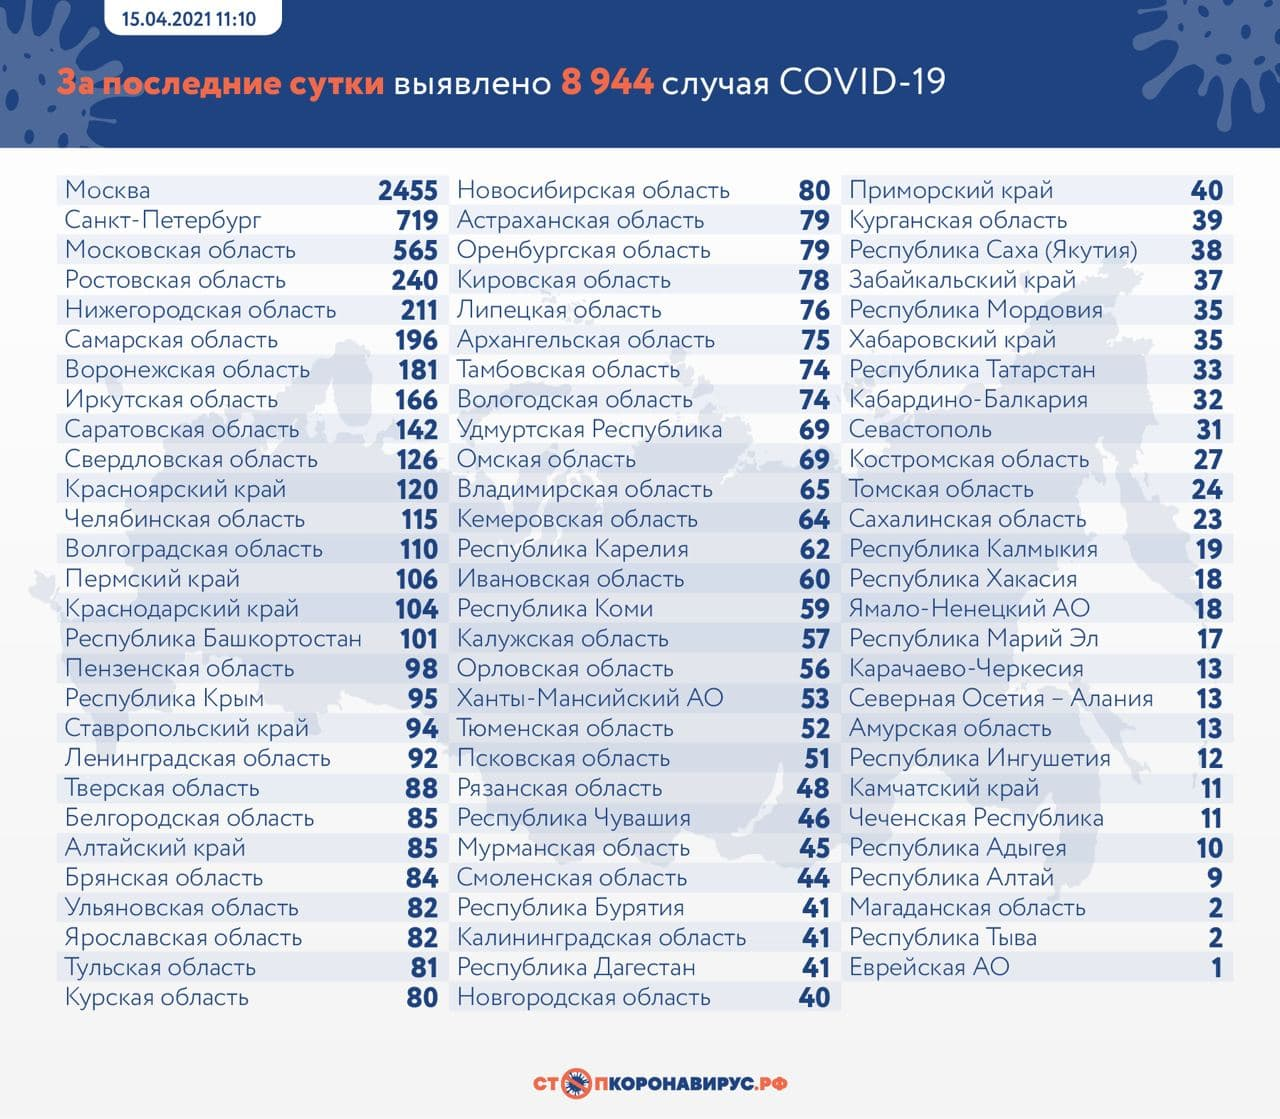 Статистика по заболевшим. Фото © стопкоронавирус.рф